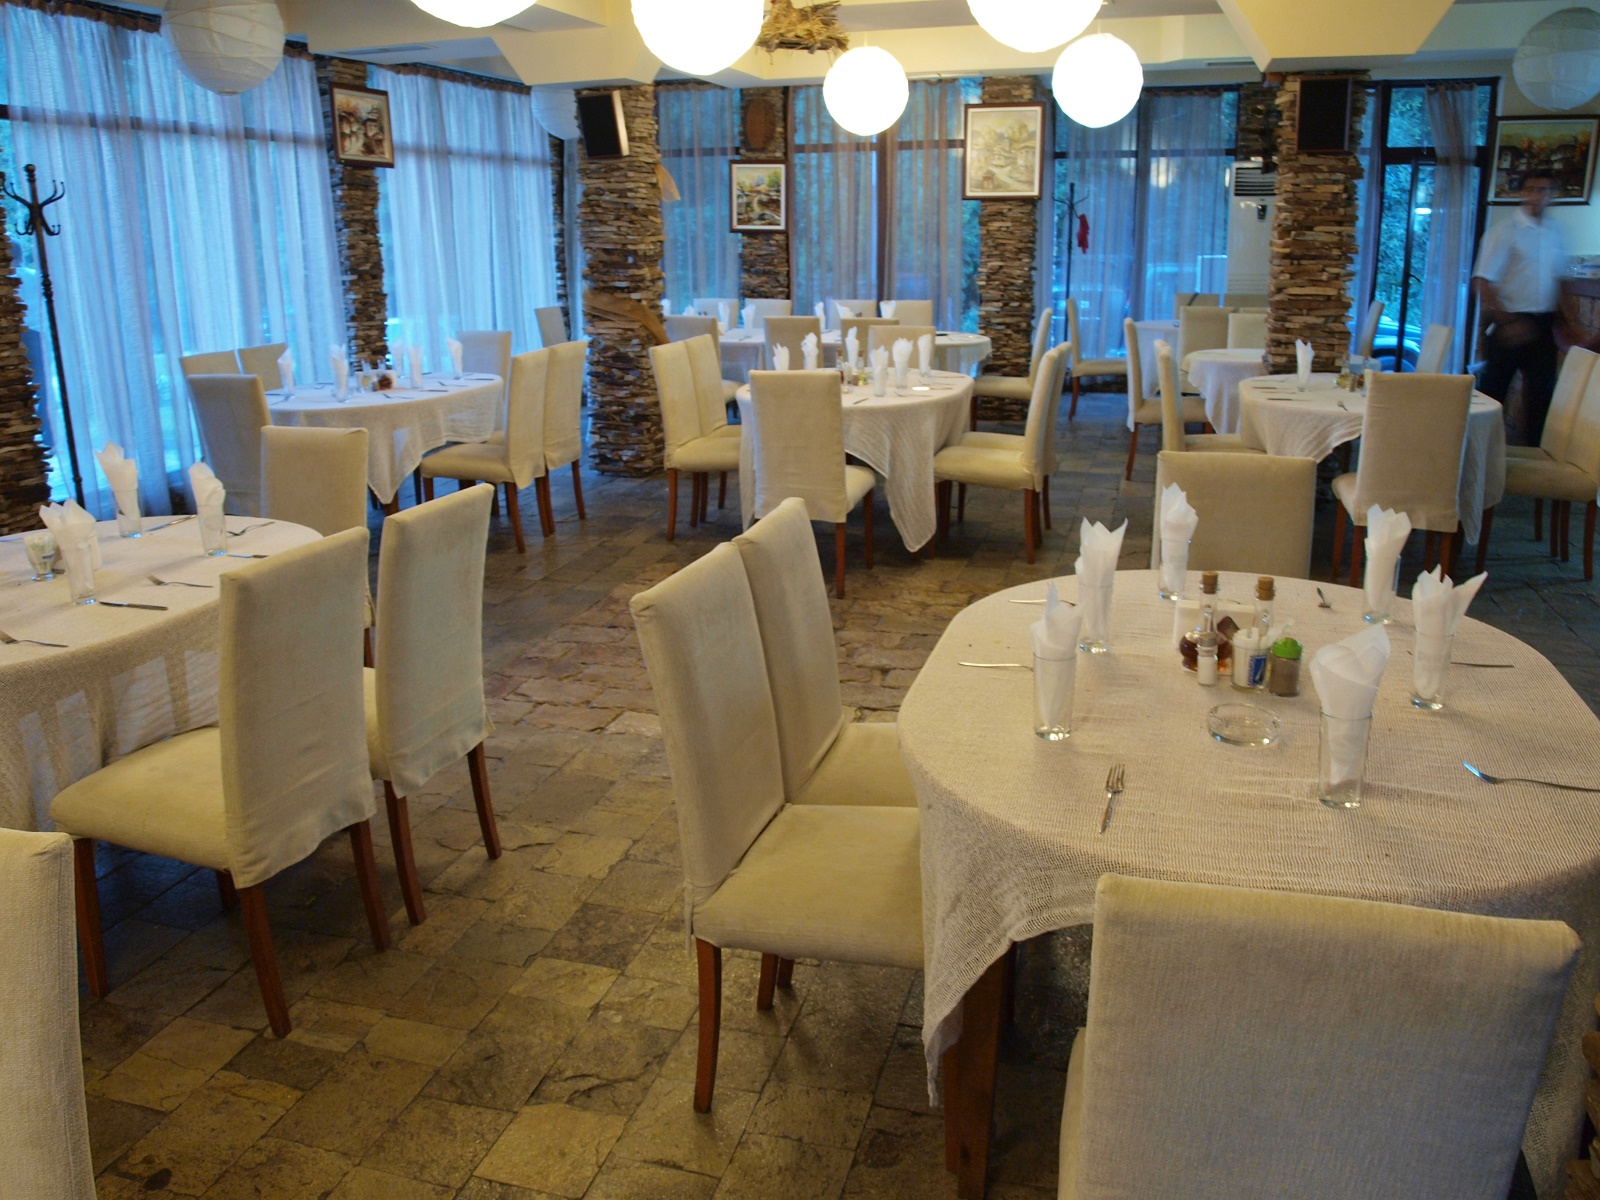 Ресторант Петрелийски, с. Огняново - традиционна, здравословна и веган кухня